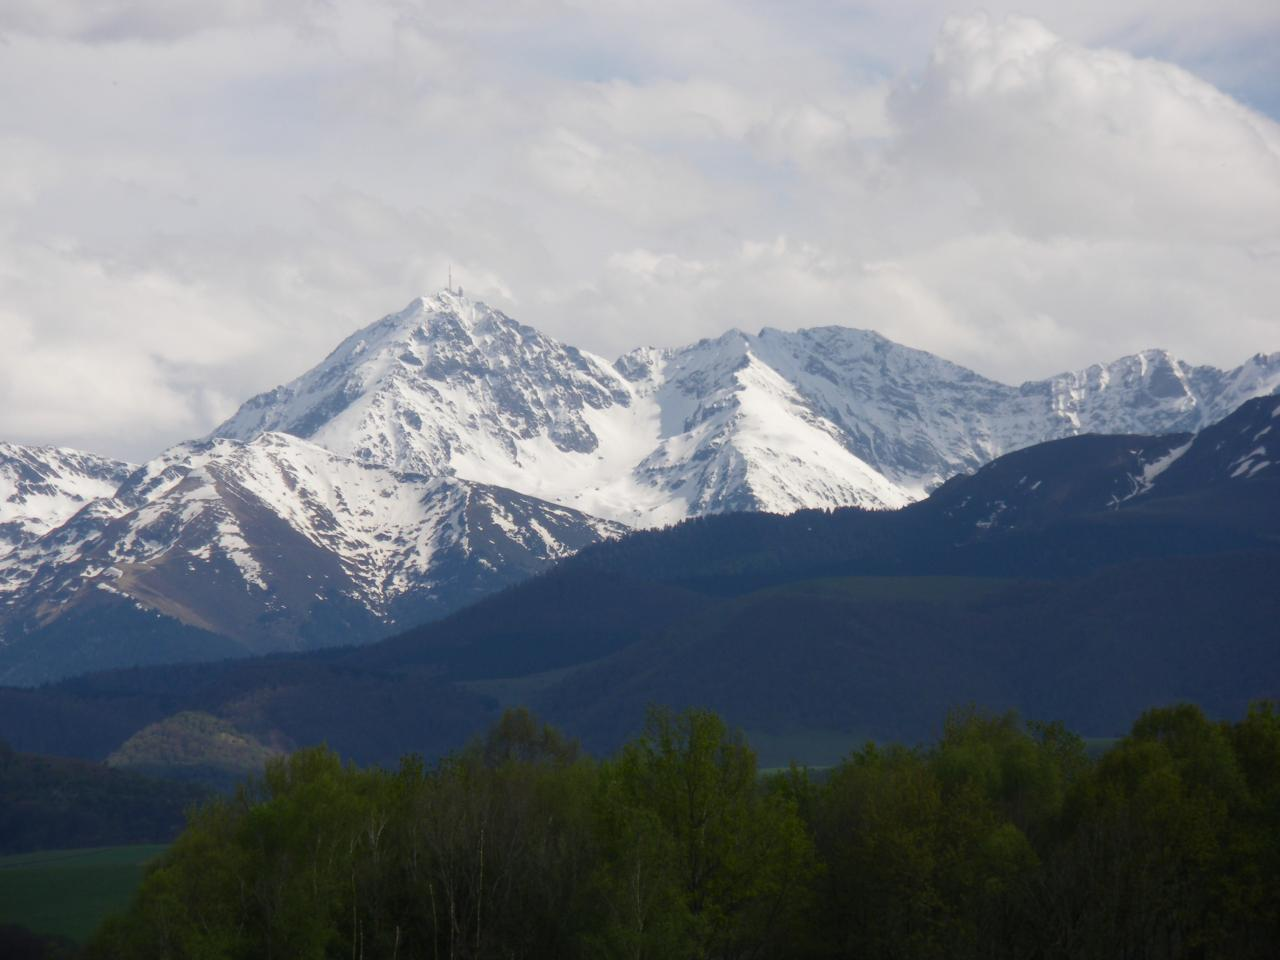 Le Pic du Midi de Bigorre, 2876 mètres